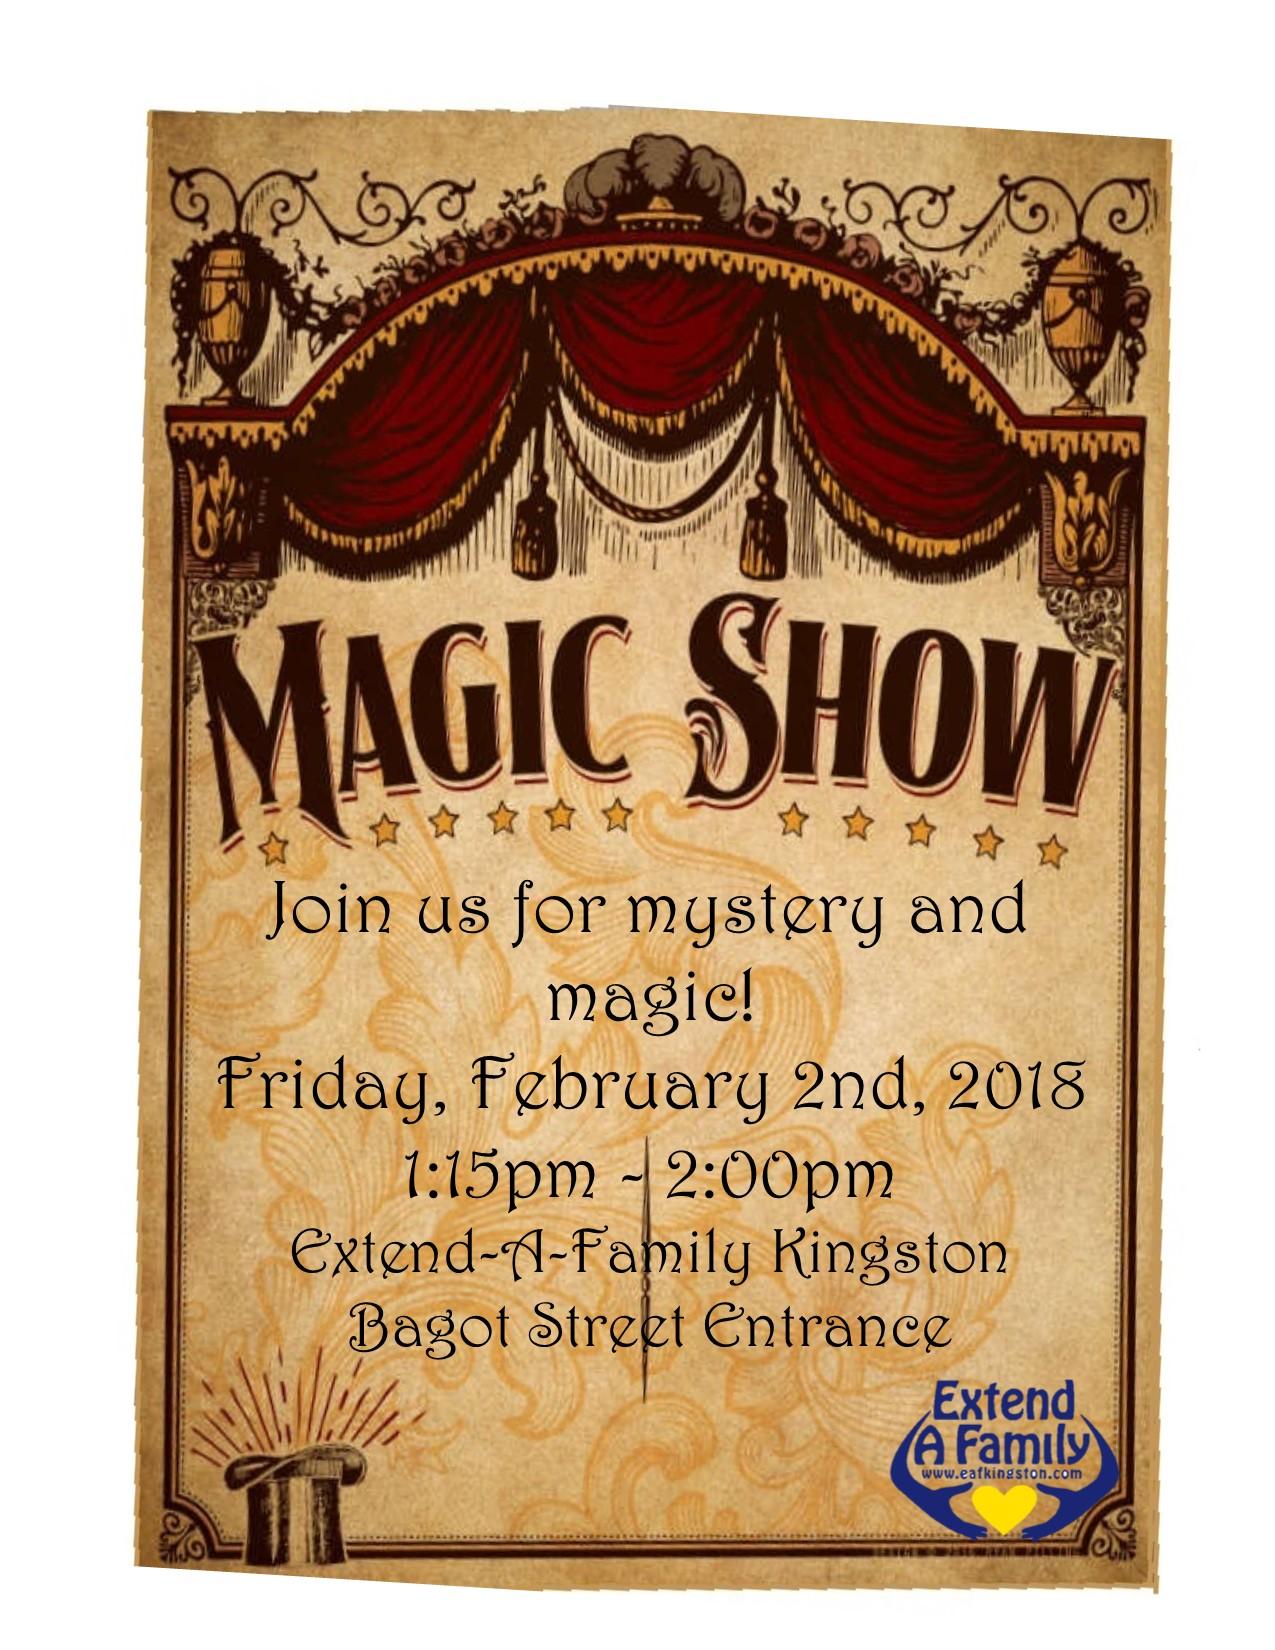 Magic Show Invite 01.25.2018.jpg